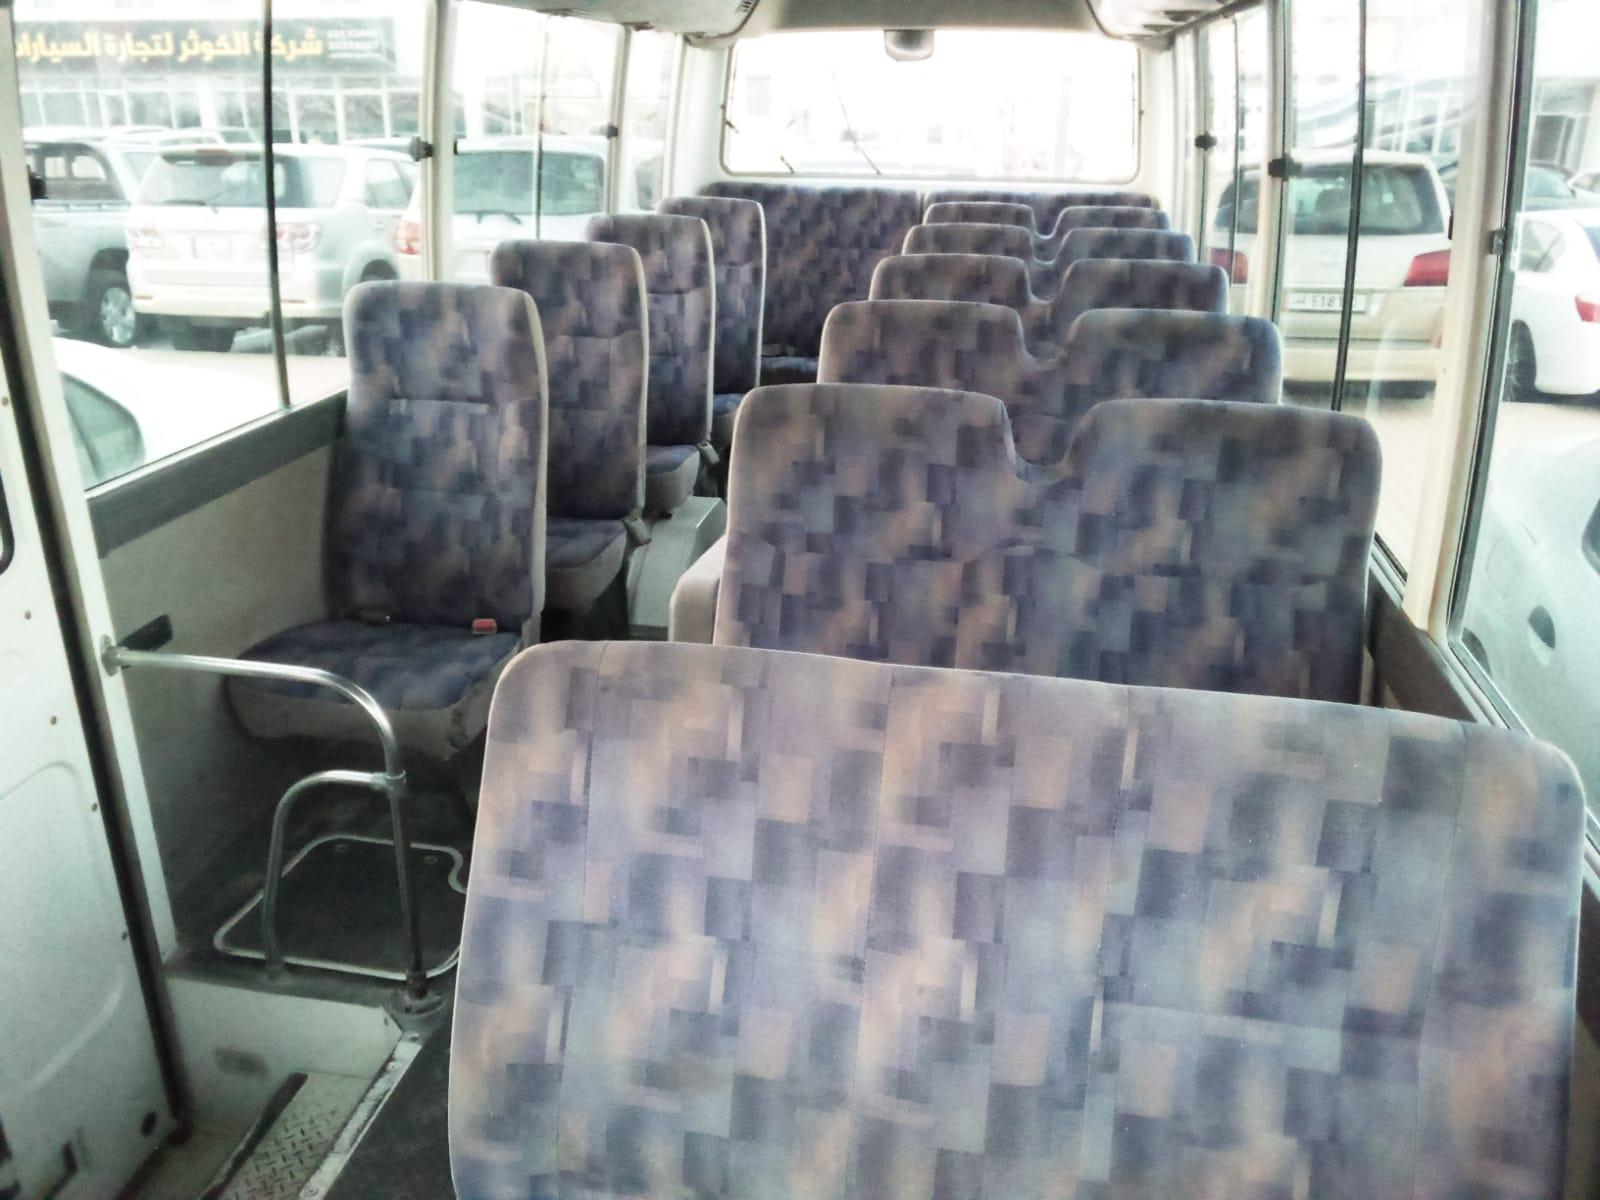 Nissan Civilian Bus-30 Seater-Diesel Engine-Origin